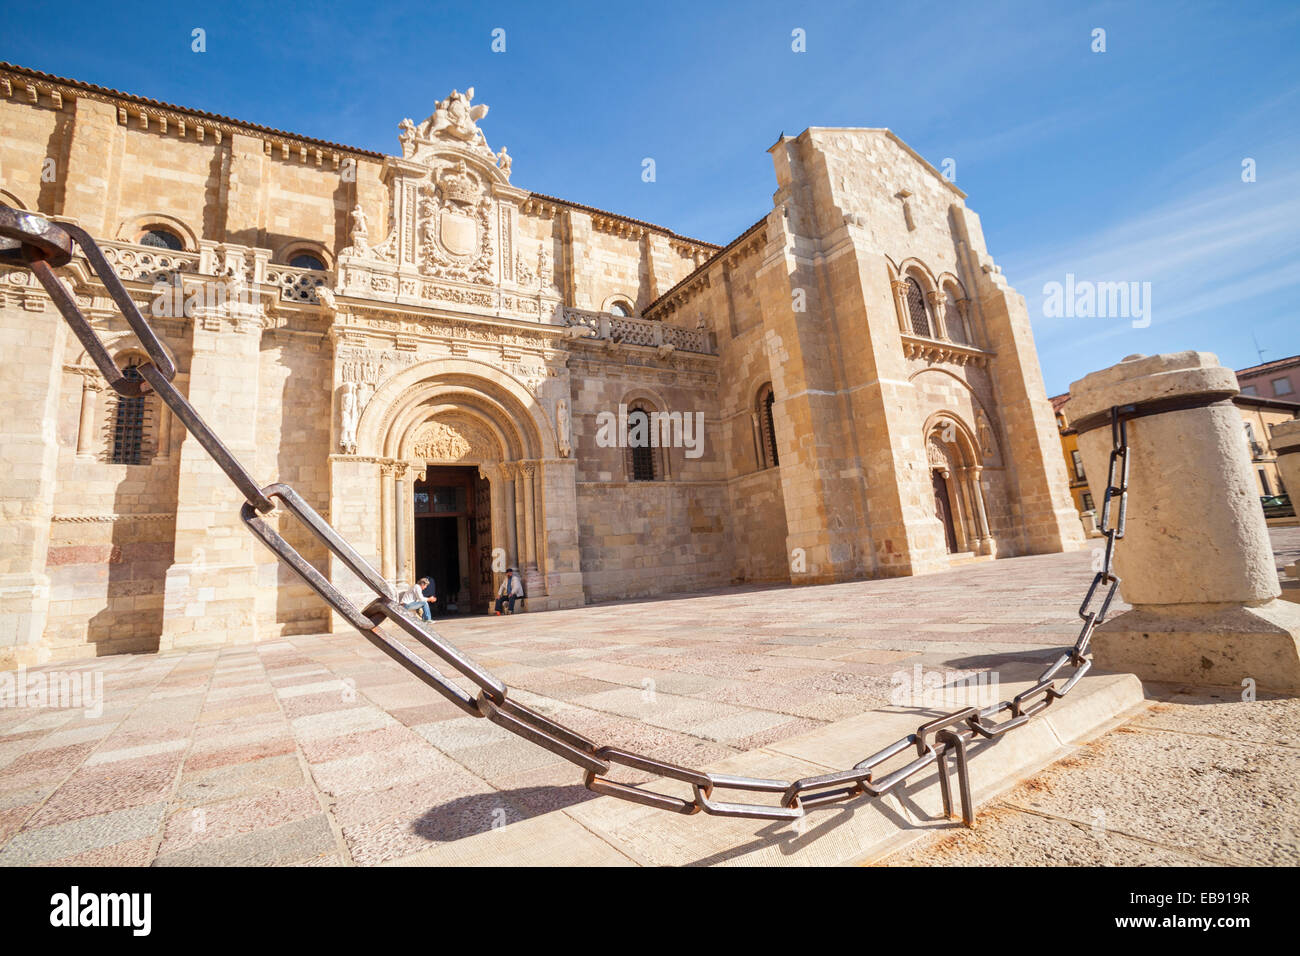 Real Colegiata de San Isidoro in Leon, Way of St. James, Leon, Spain - Stock Image